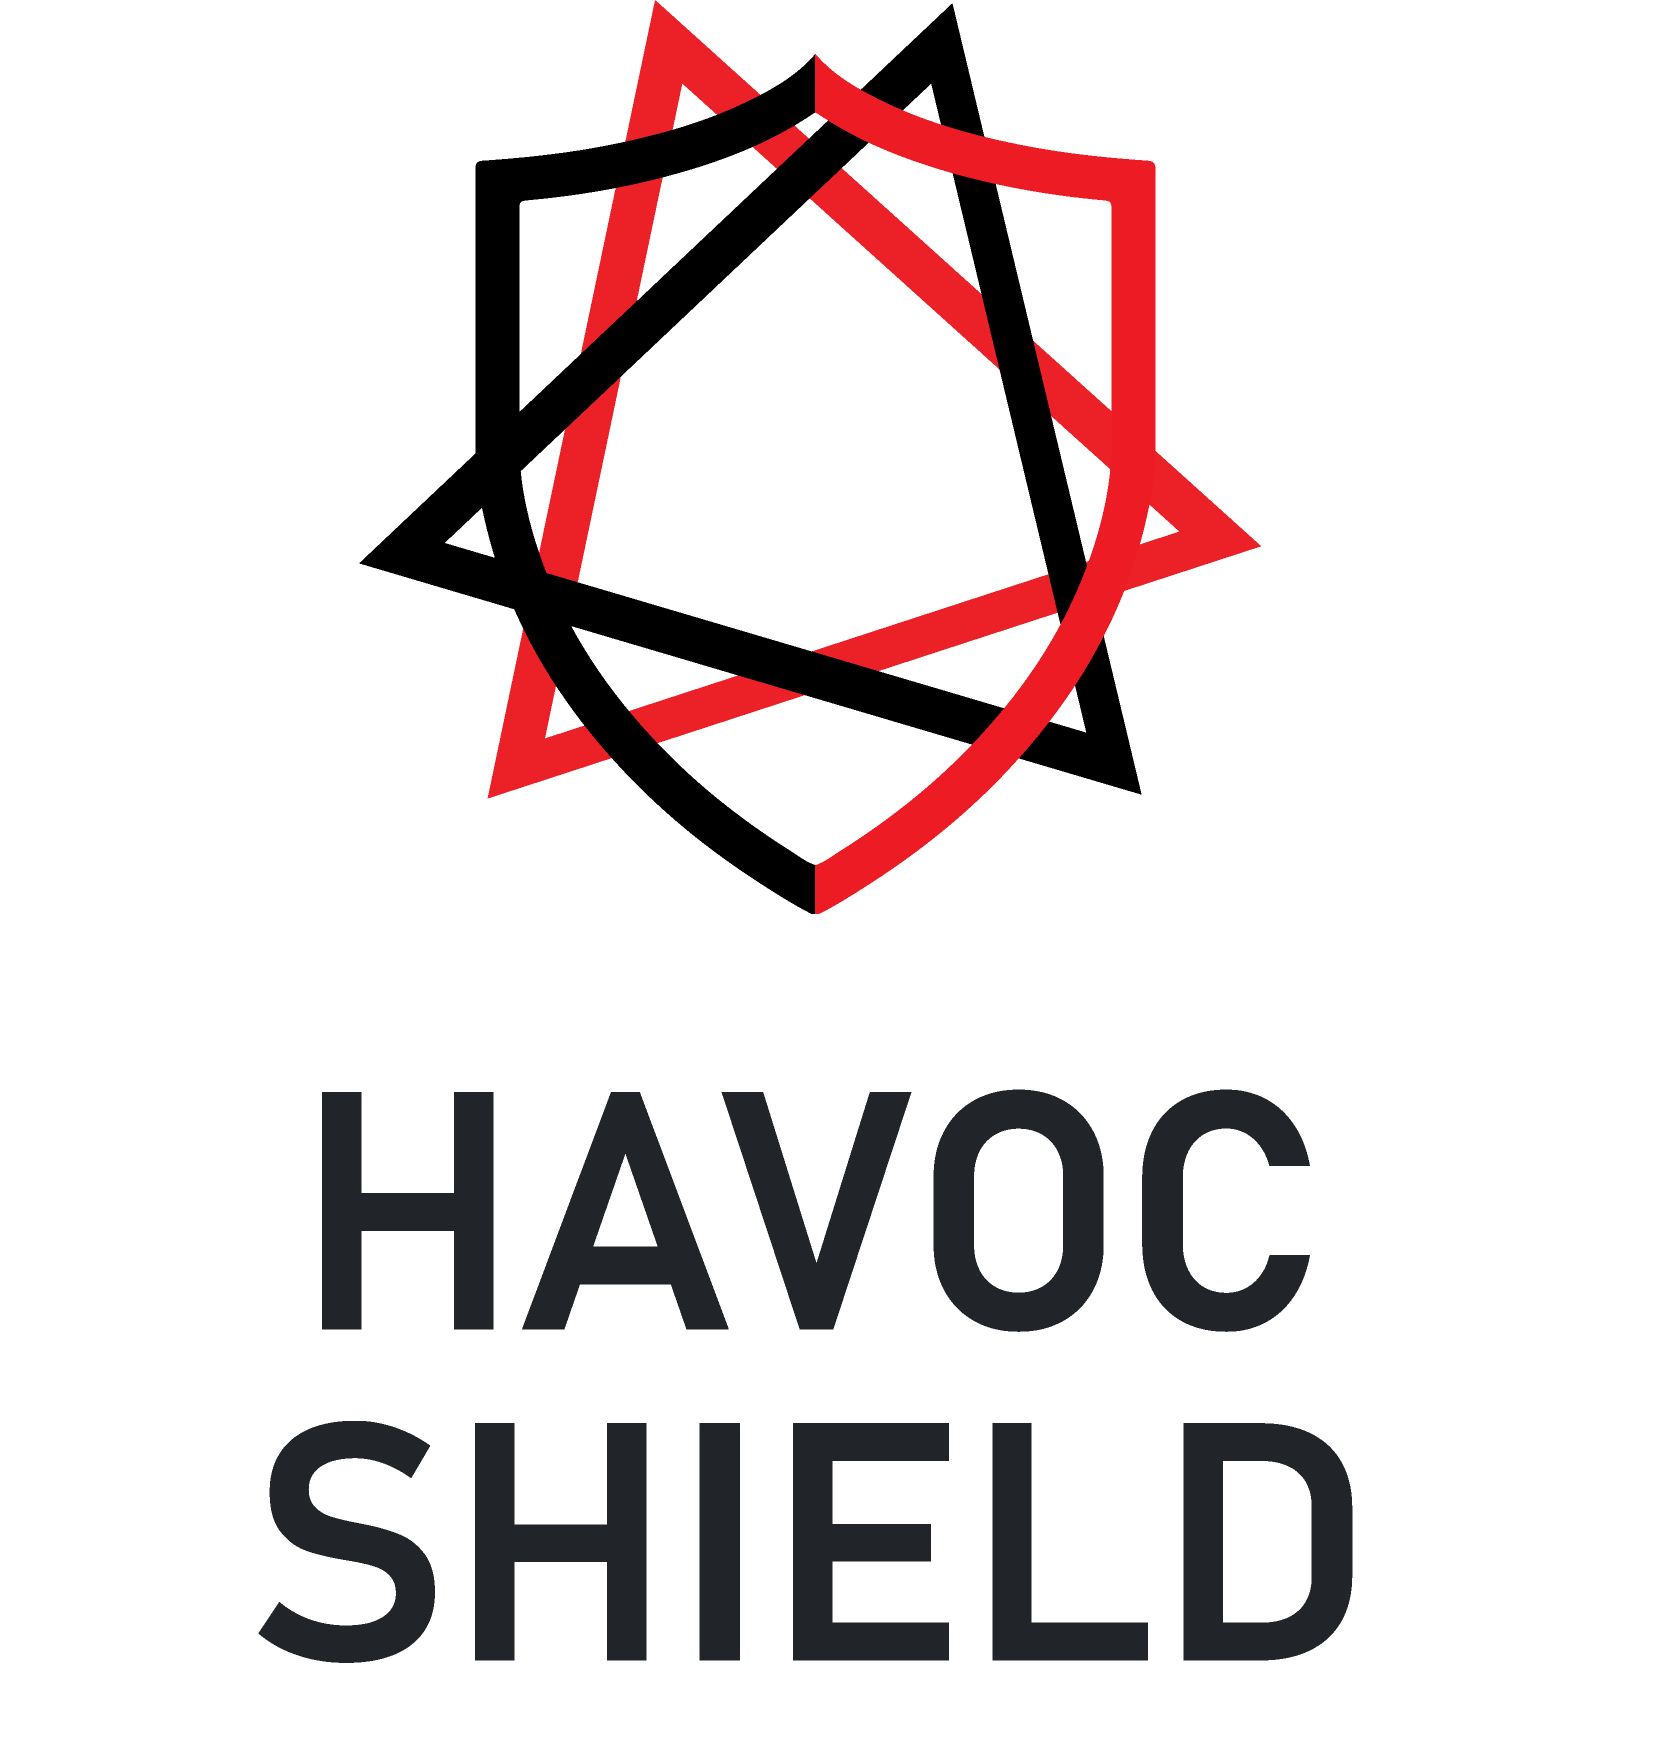 havoc shield logo - shield on top - no gradient